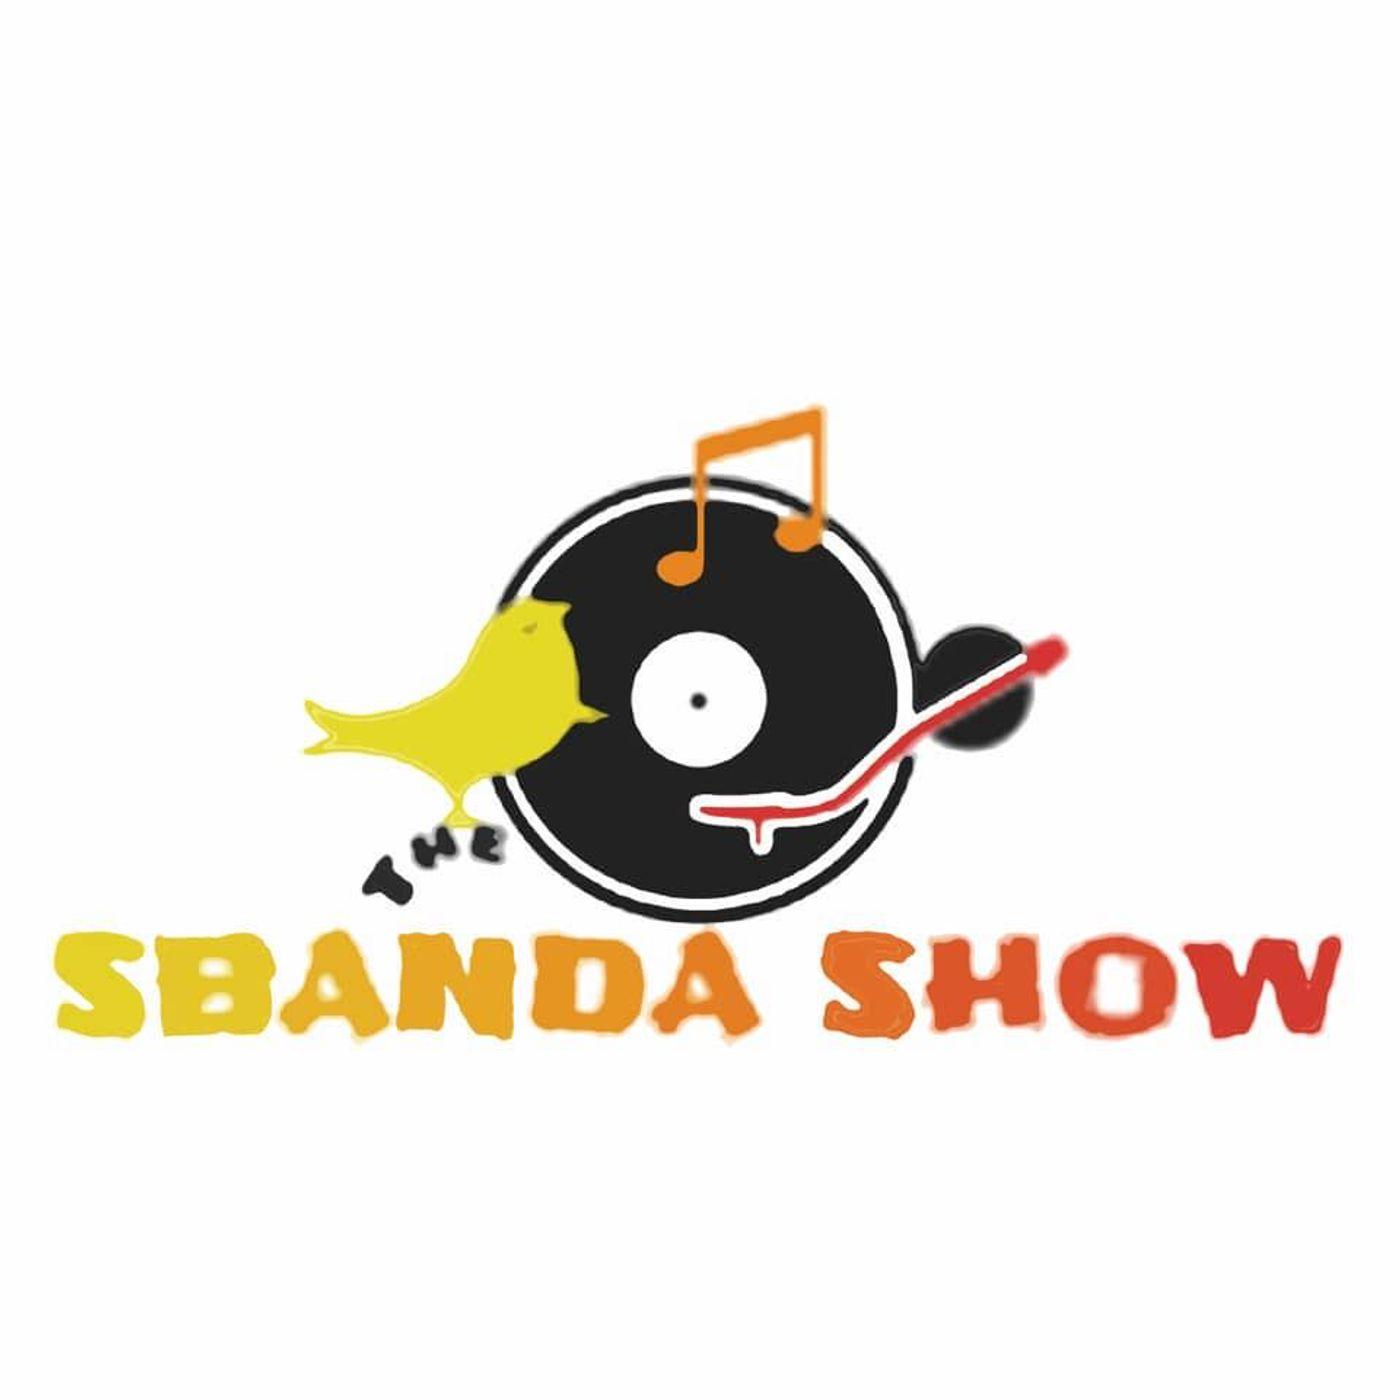 The Sbanda Show 6